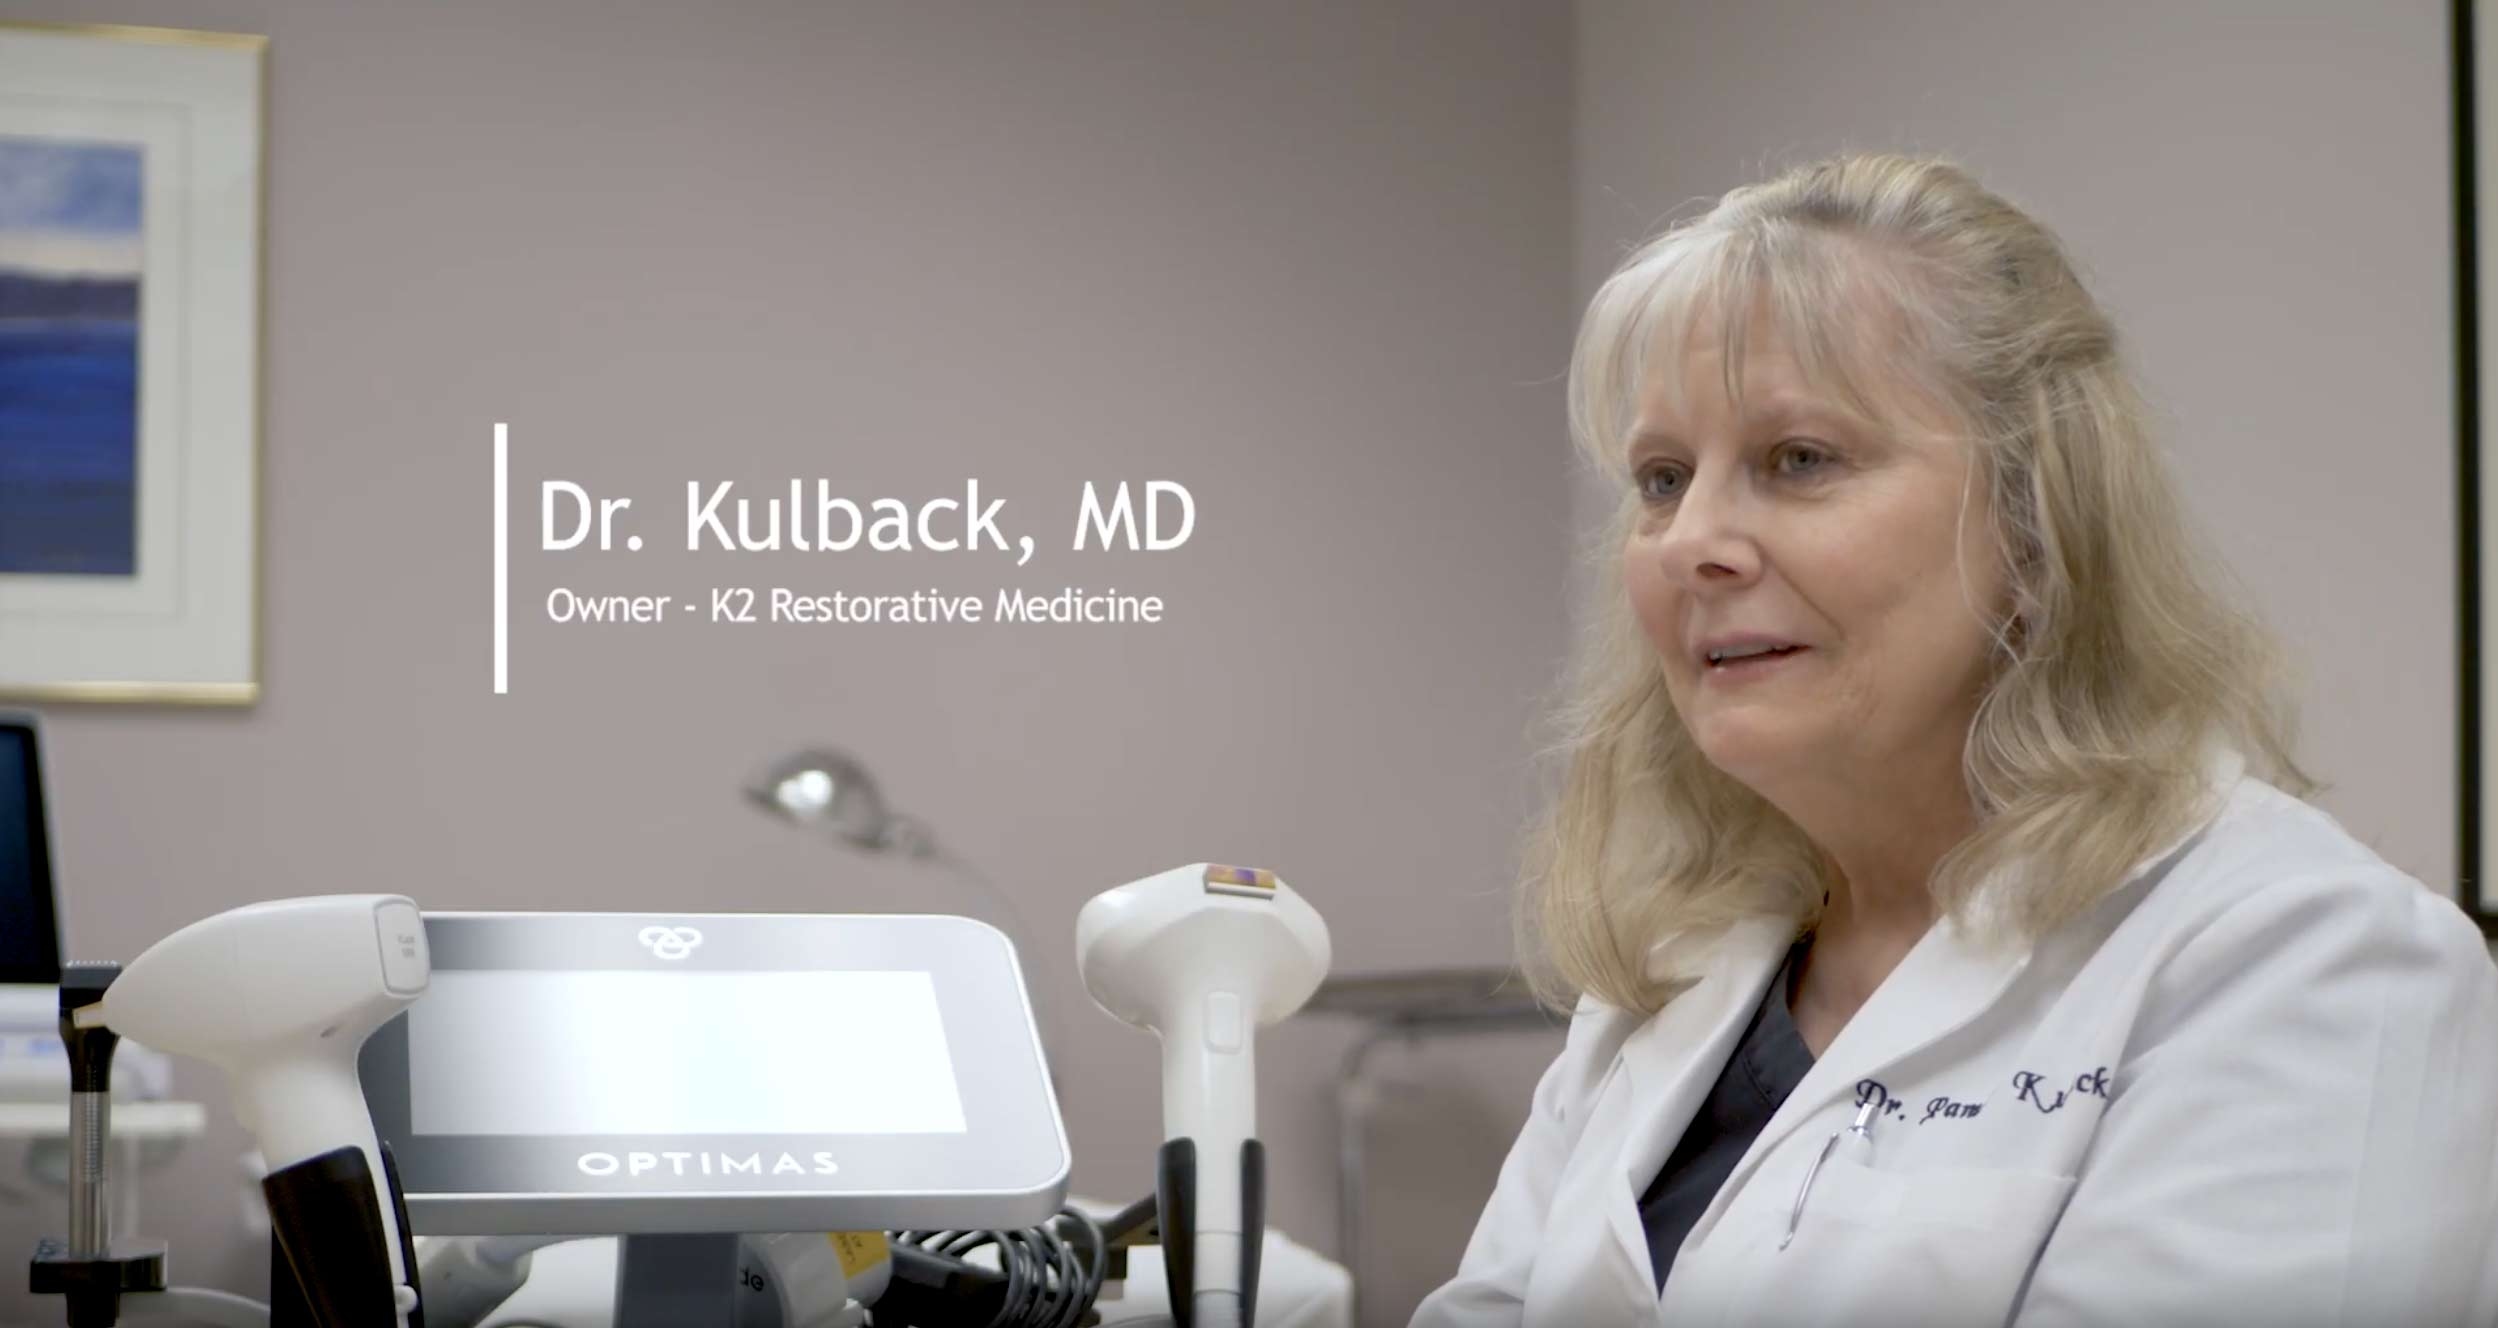 Dr. Kulback - K2 Restorative Medicine